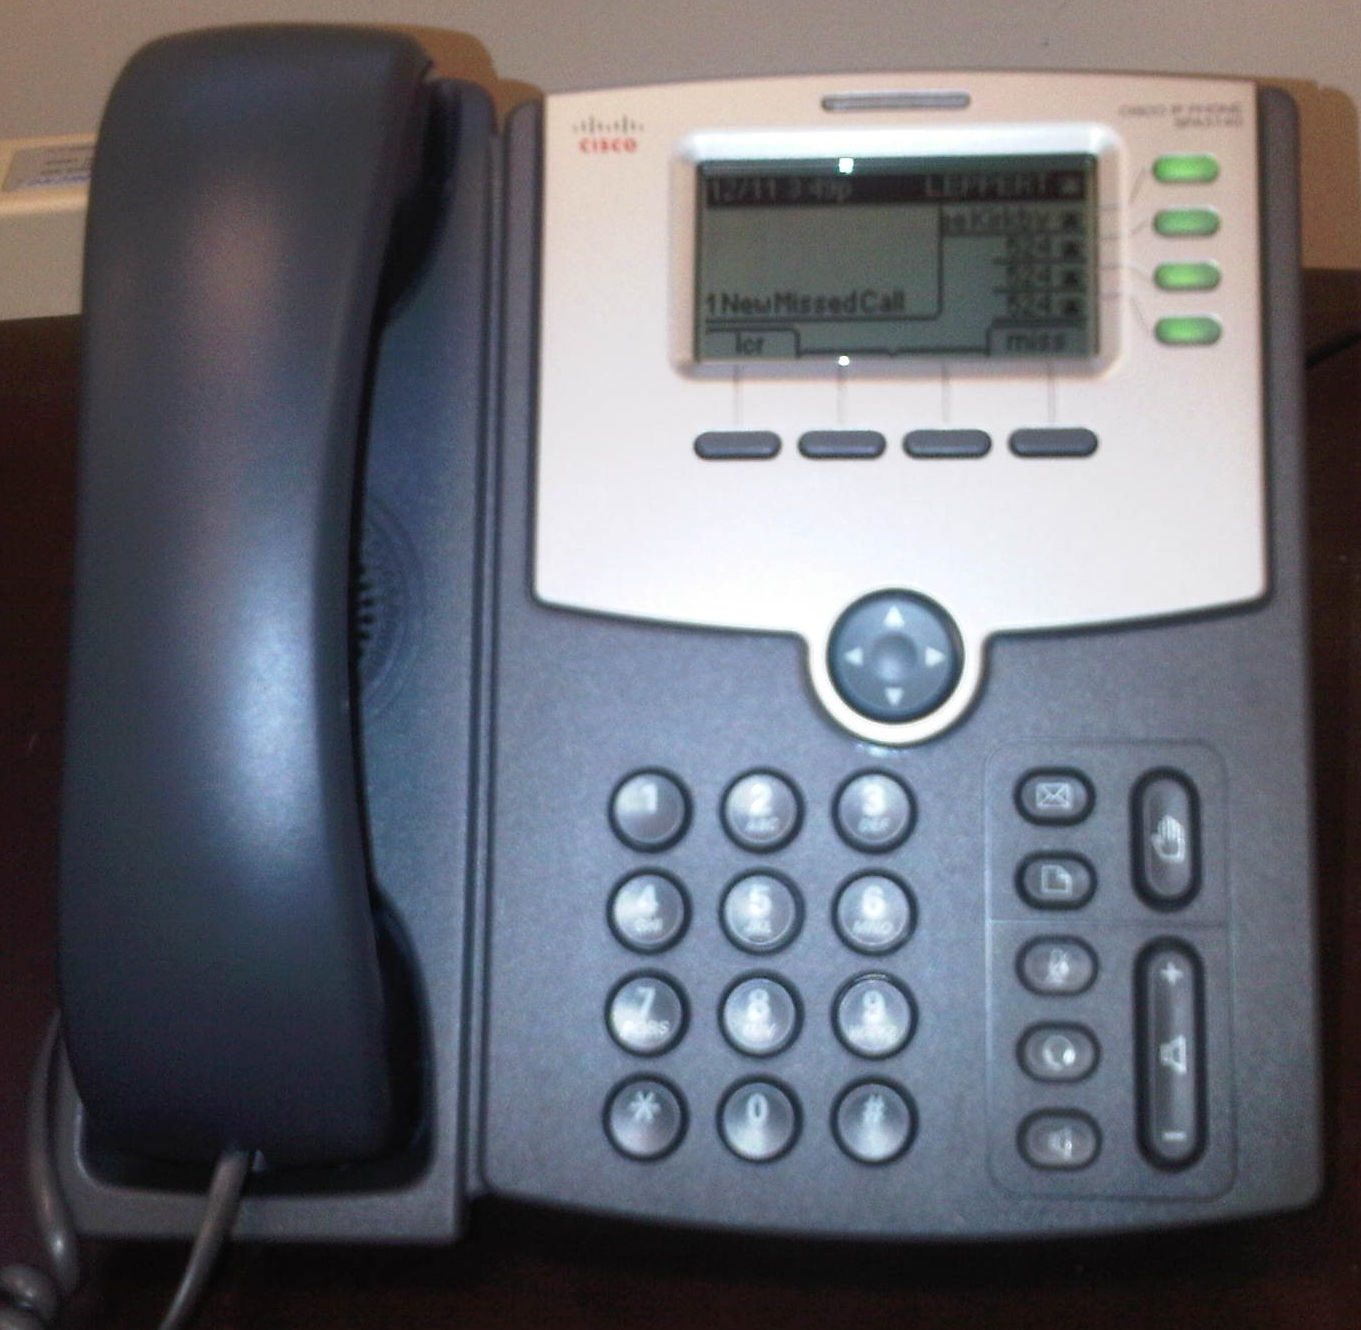 Cisco Voip Phone on Desk